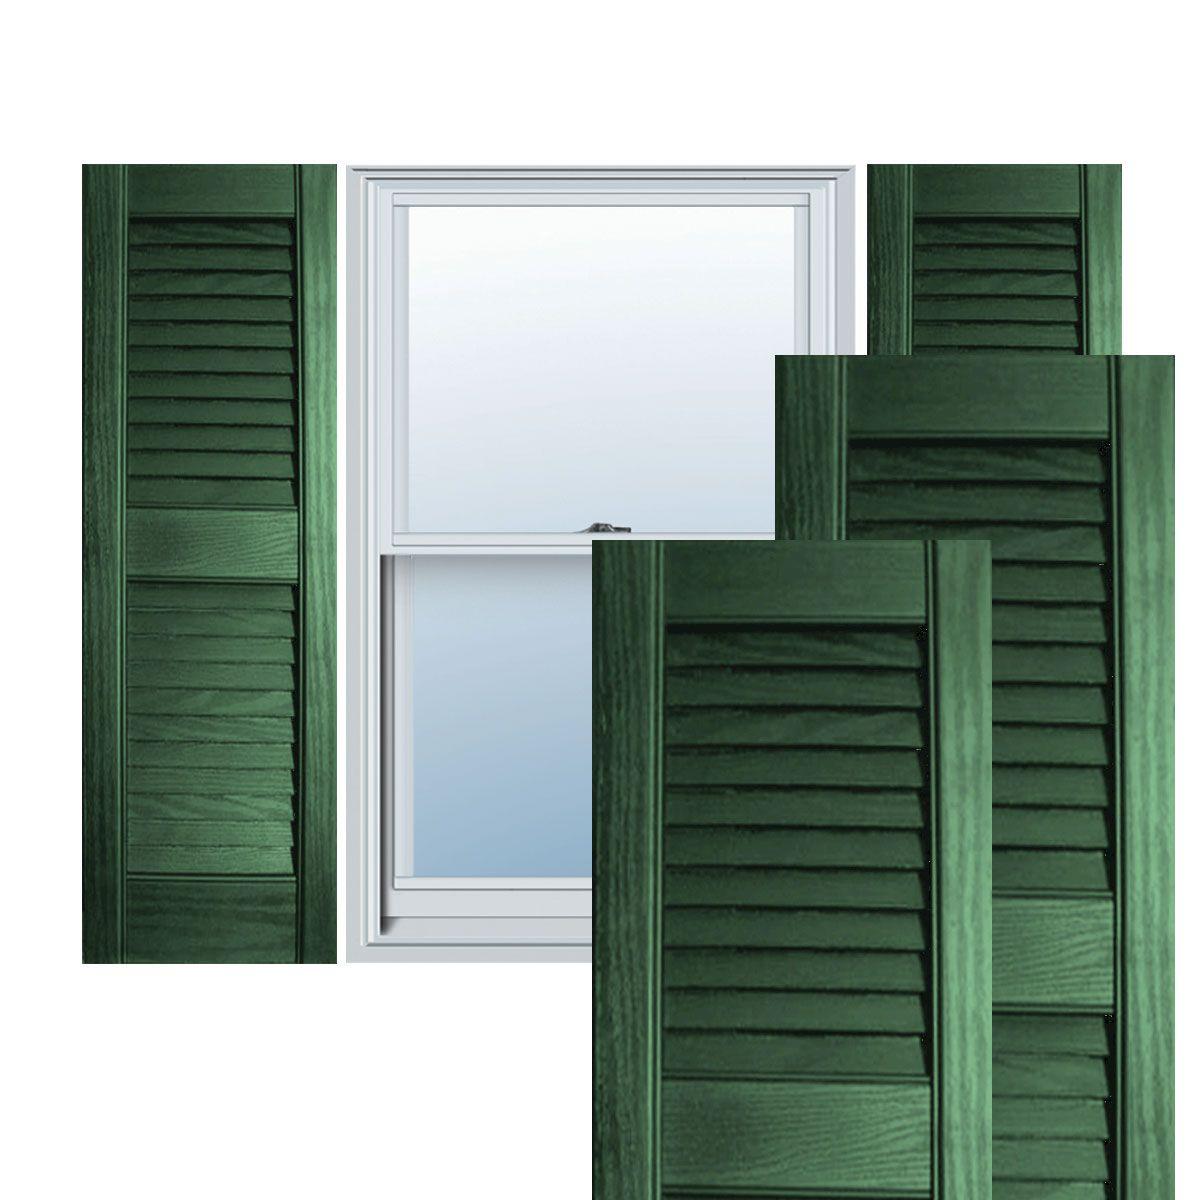 12 Inch X 28 Inch Builders Choice Vinyl Open Louver Window Shutters W Shutter Spikes Screws Per Pair Forest Green Louver Windows Shutters Exterior Exterior Vinyl Shutters